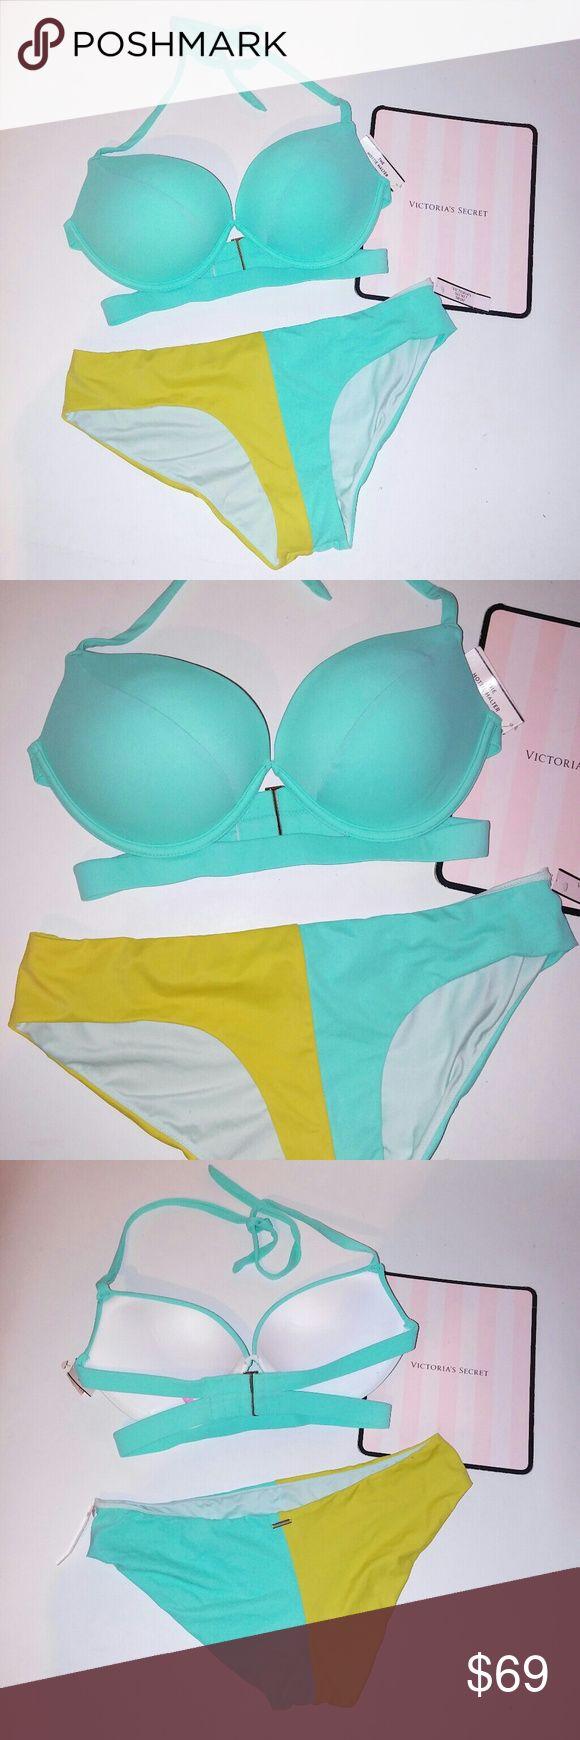 Victoria Secret Swim Suit Bikini Victoria Secret Swim Suit Bikini 34D top Medium bottom Hottie halter Seafoam Colorblock Push up New with tags Victoria's Secret Swim Bikinis